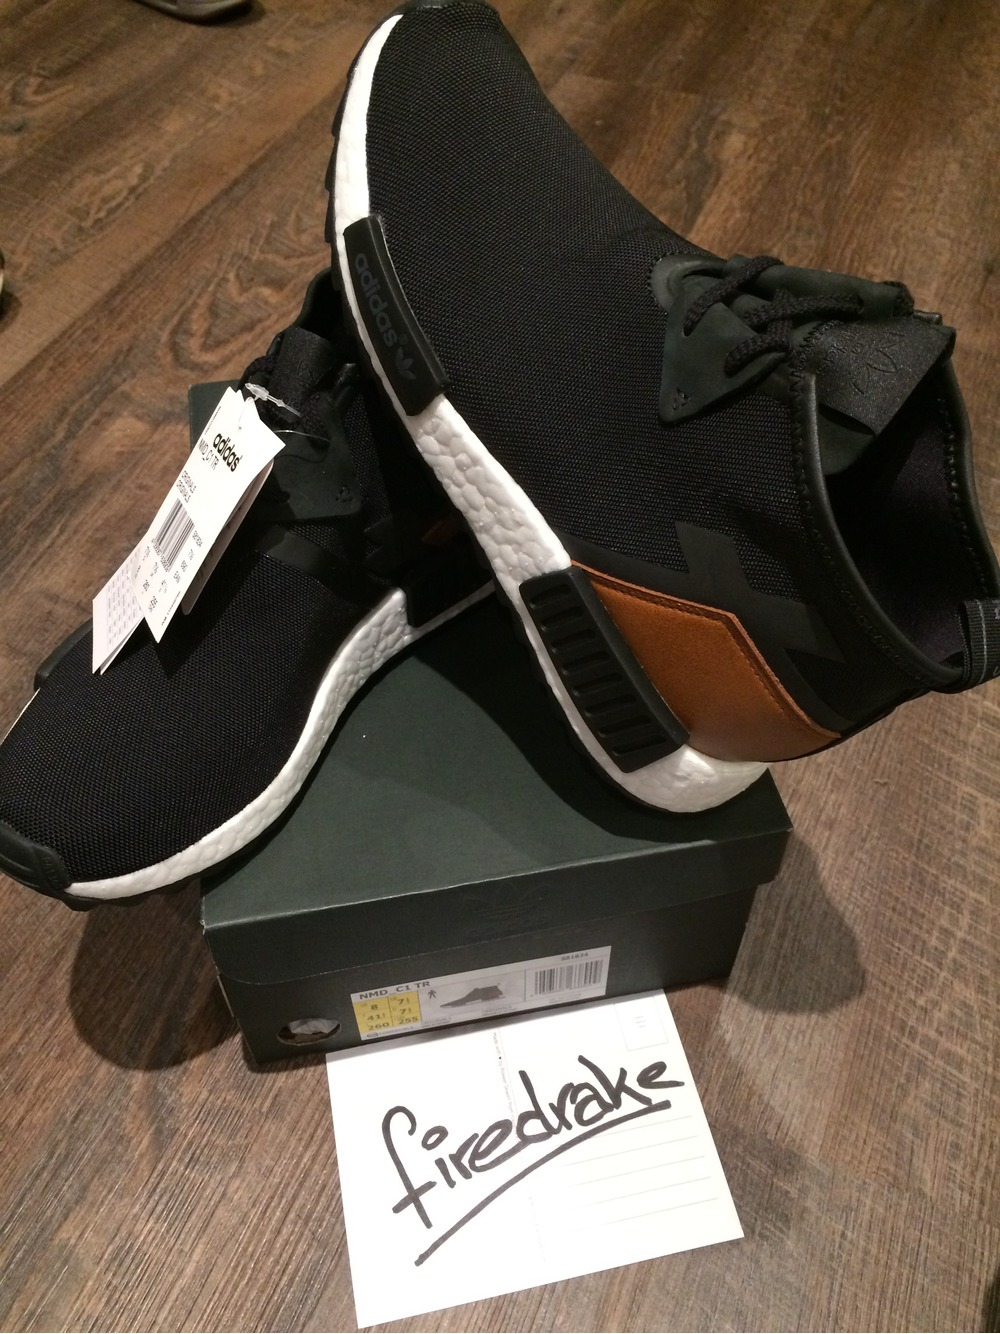 a3b37bde407fd Buy adidas nmd c1 Green cheap Rimslow